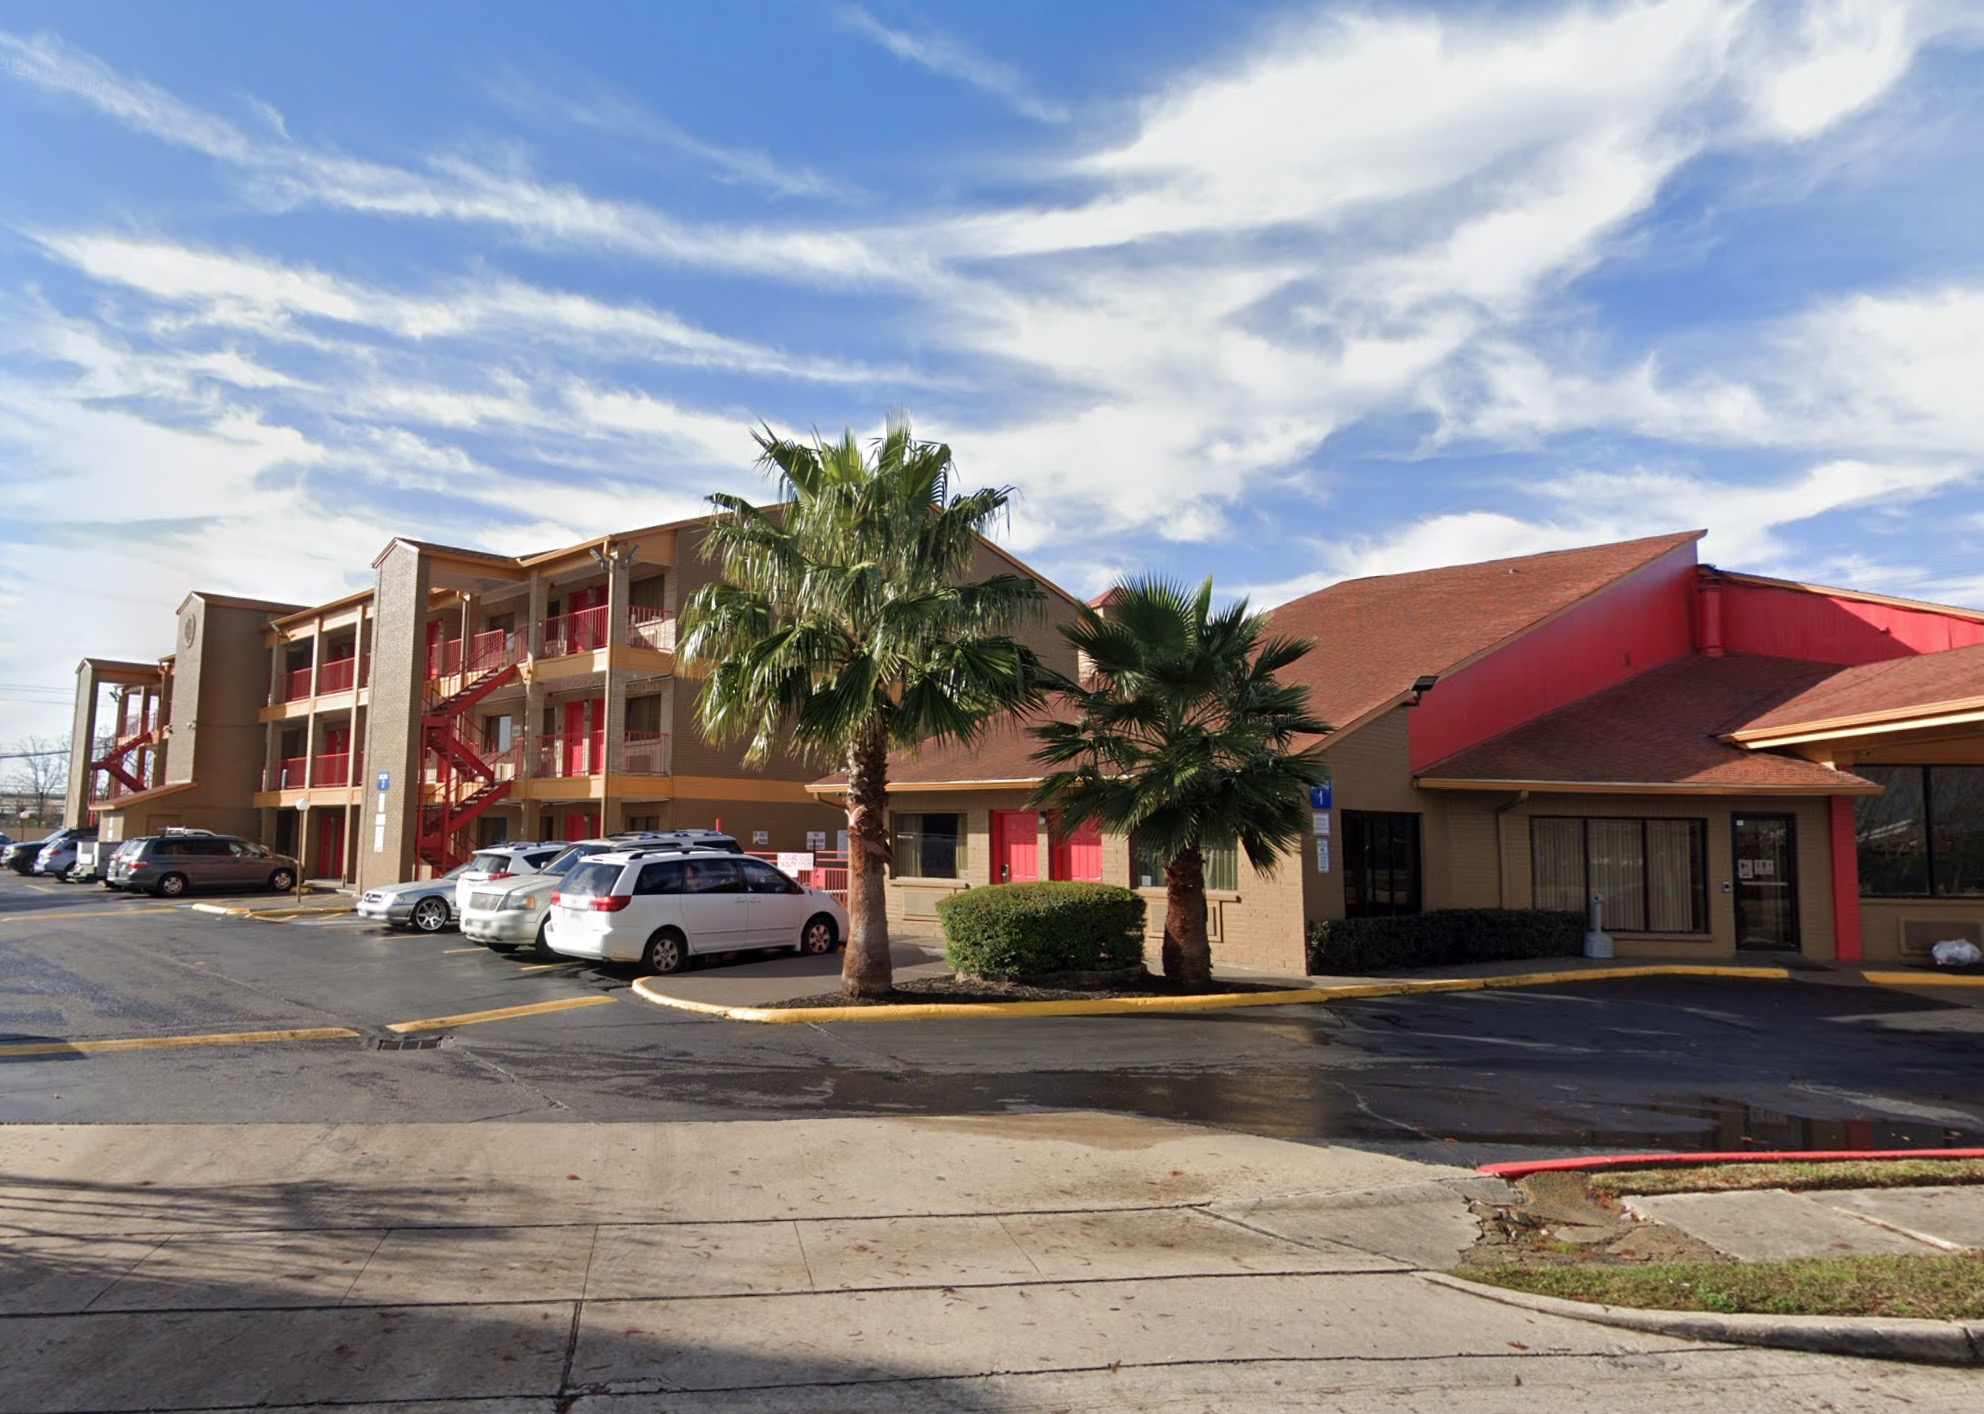 Man found shot dead in hotel near Hobby Airport